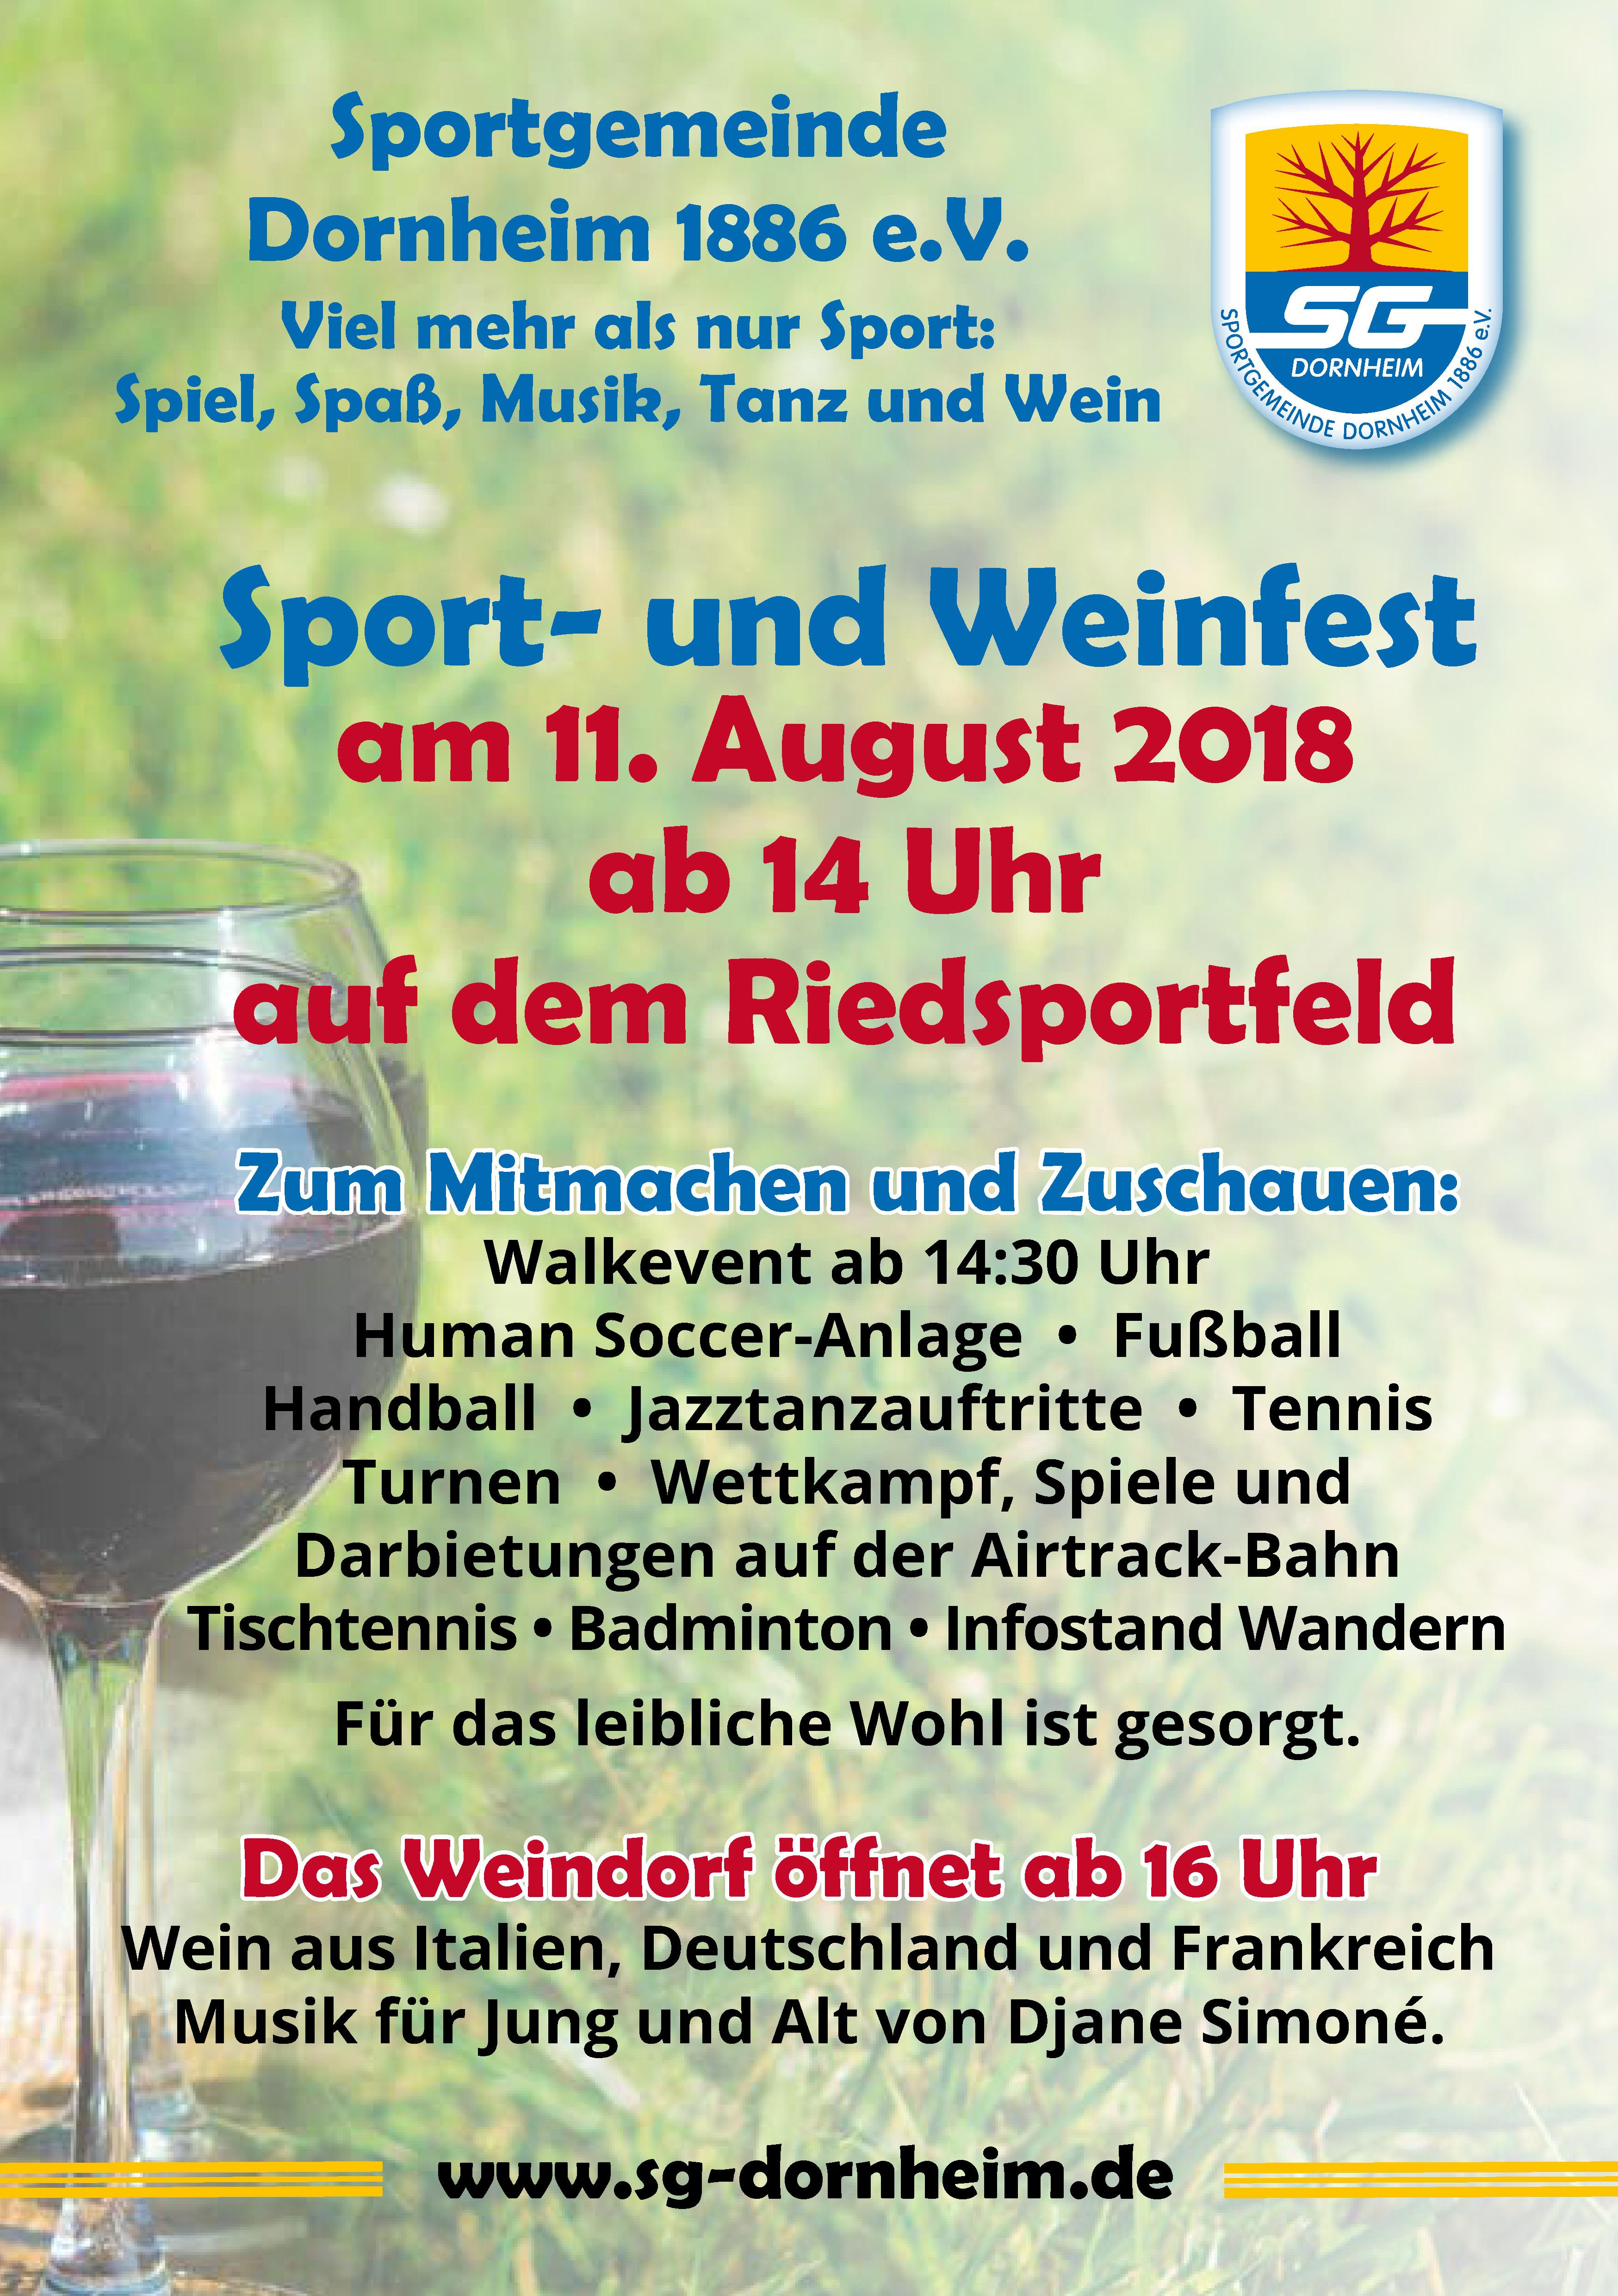 Sport & Weinfest 2018